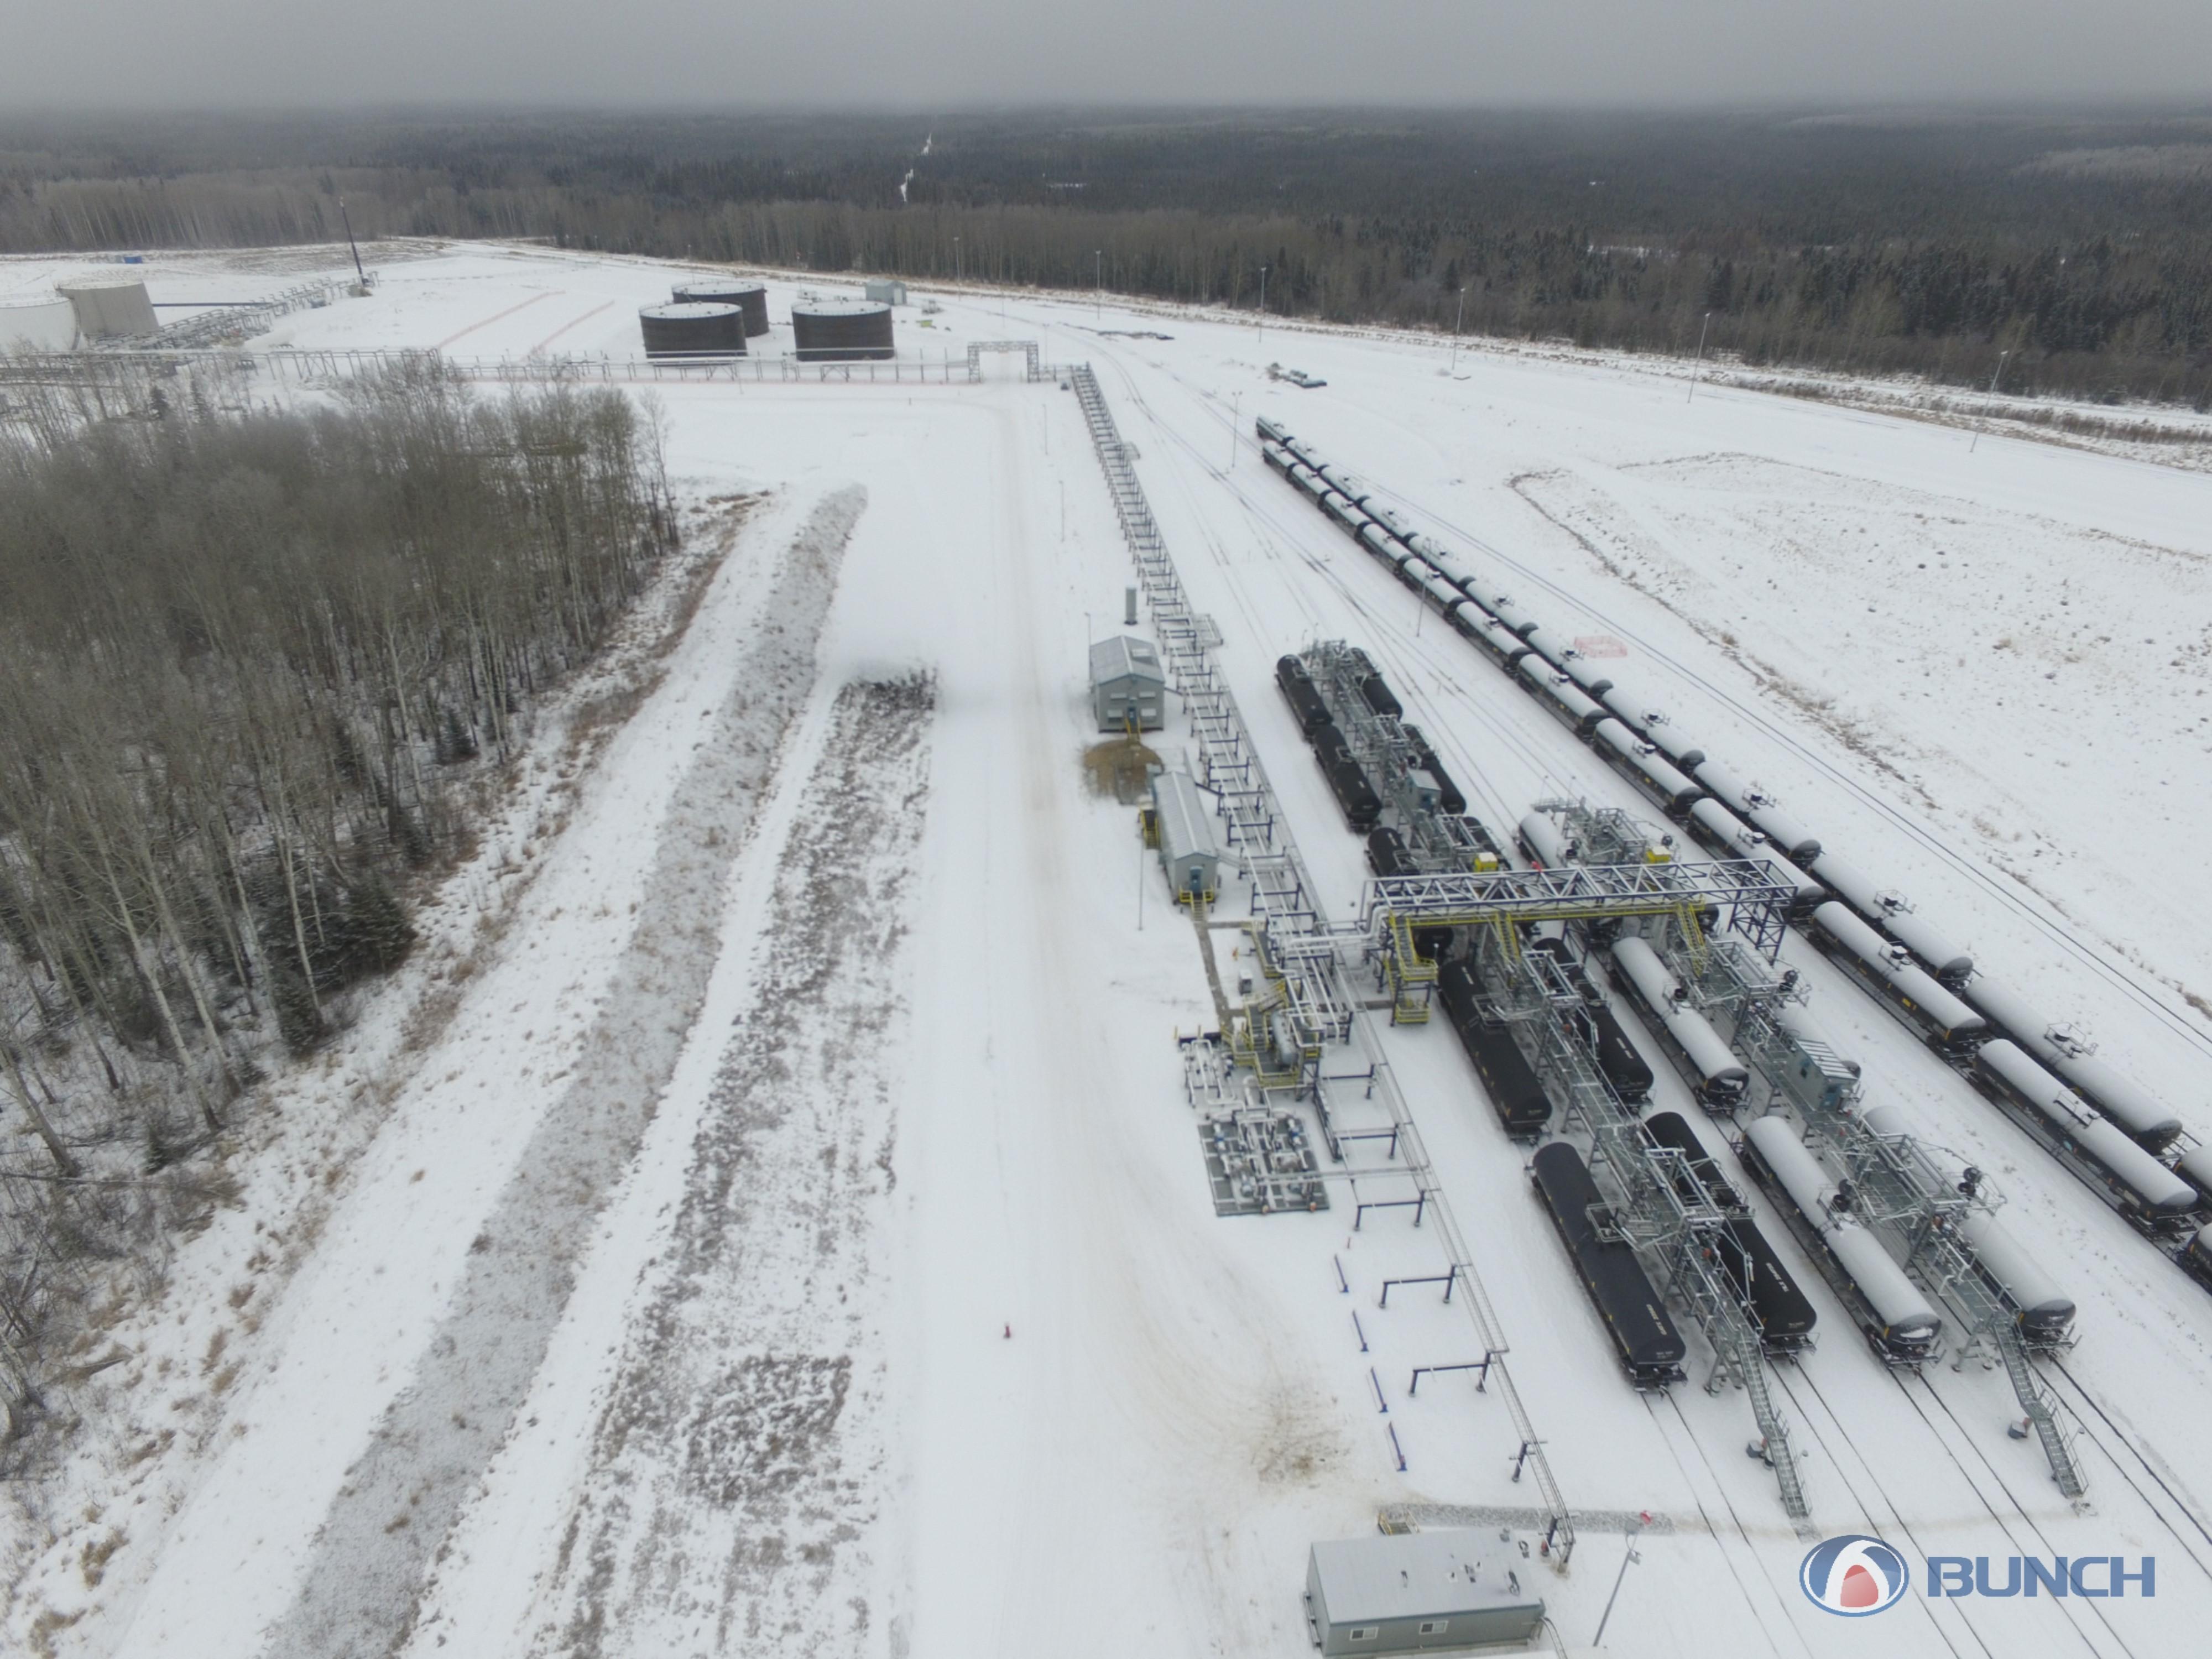 Bunch Rail Terminal Facility Construction